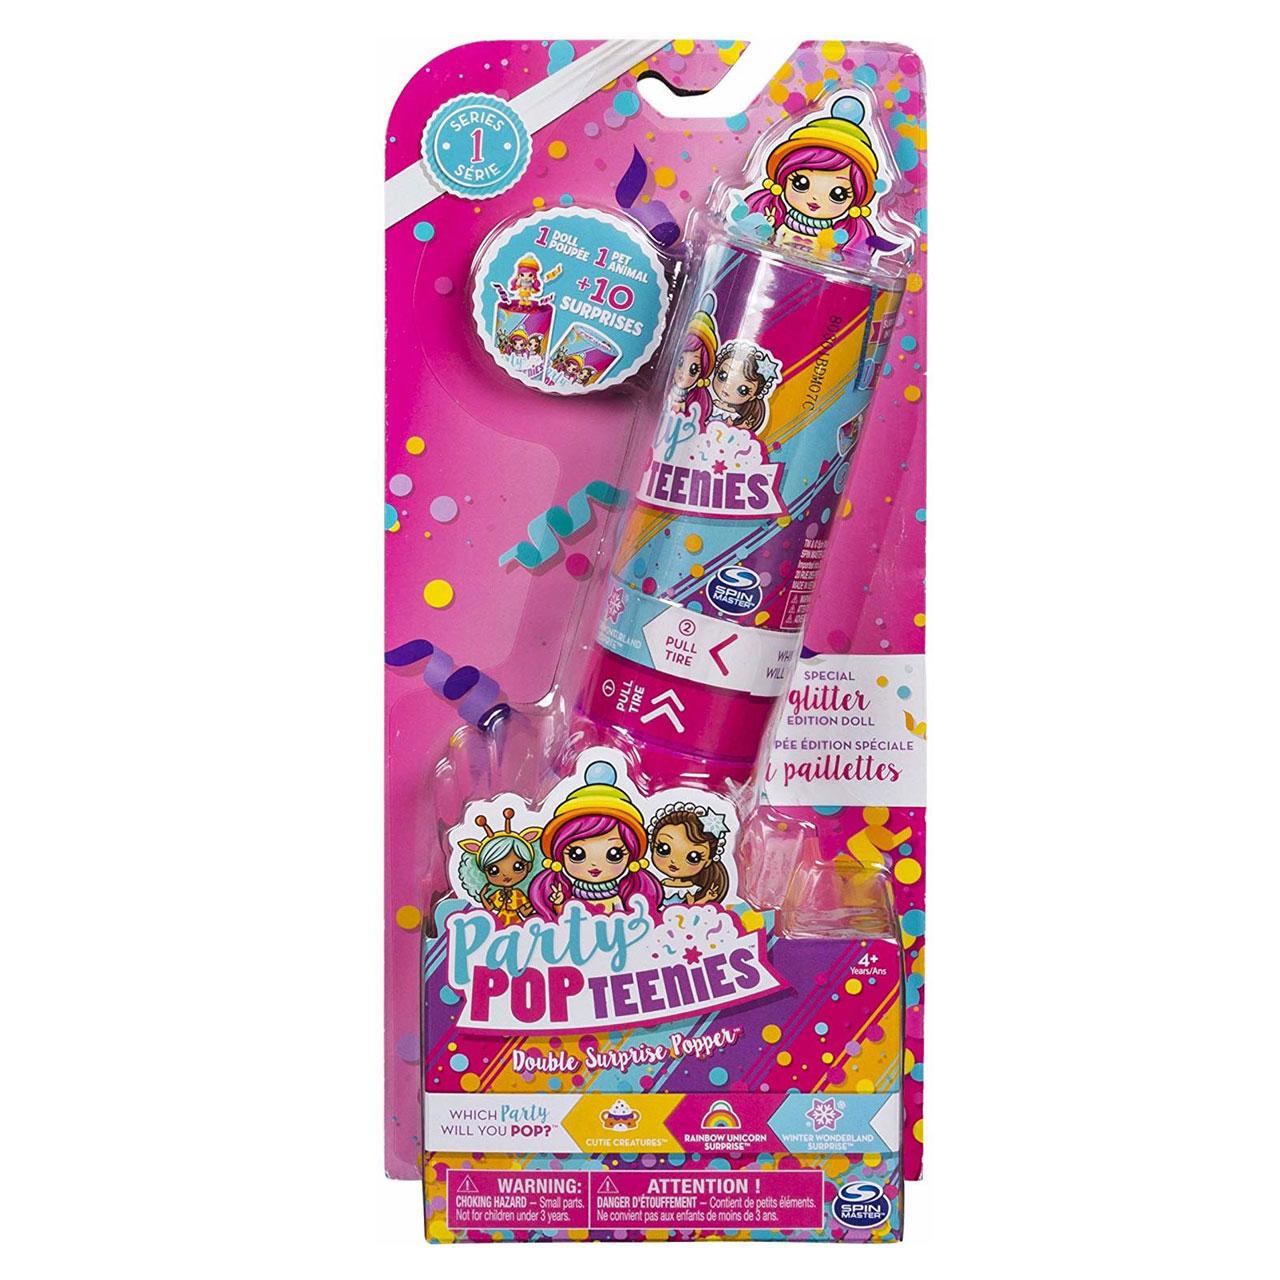 عروسک شانسی اسپین مستر مدل Party Popteenies بسته 2 عددی